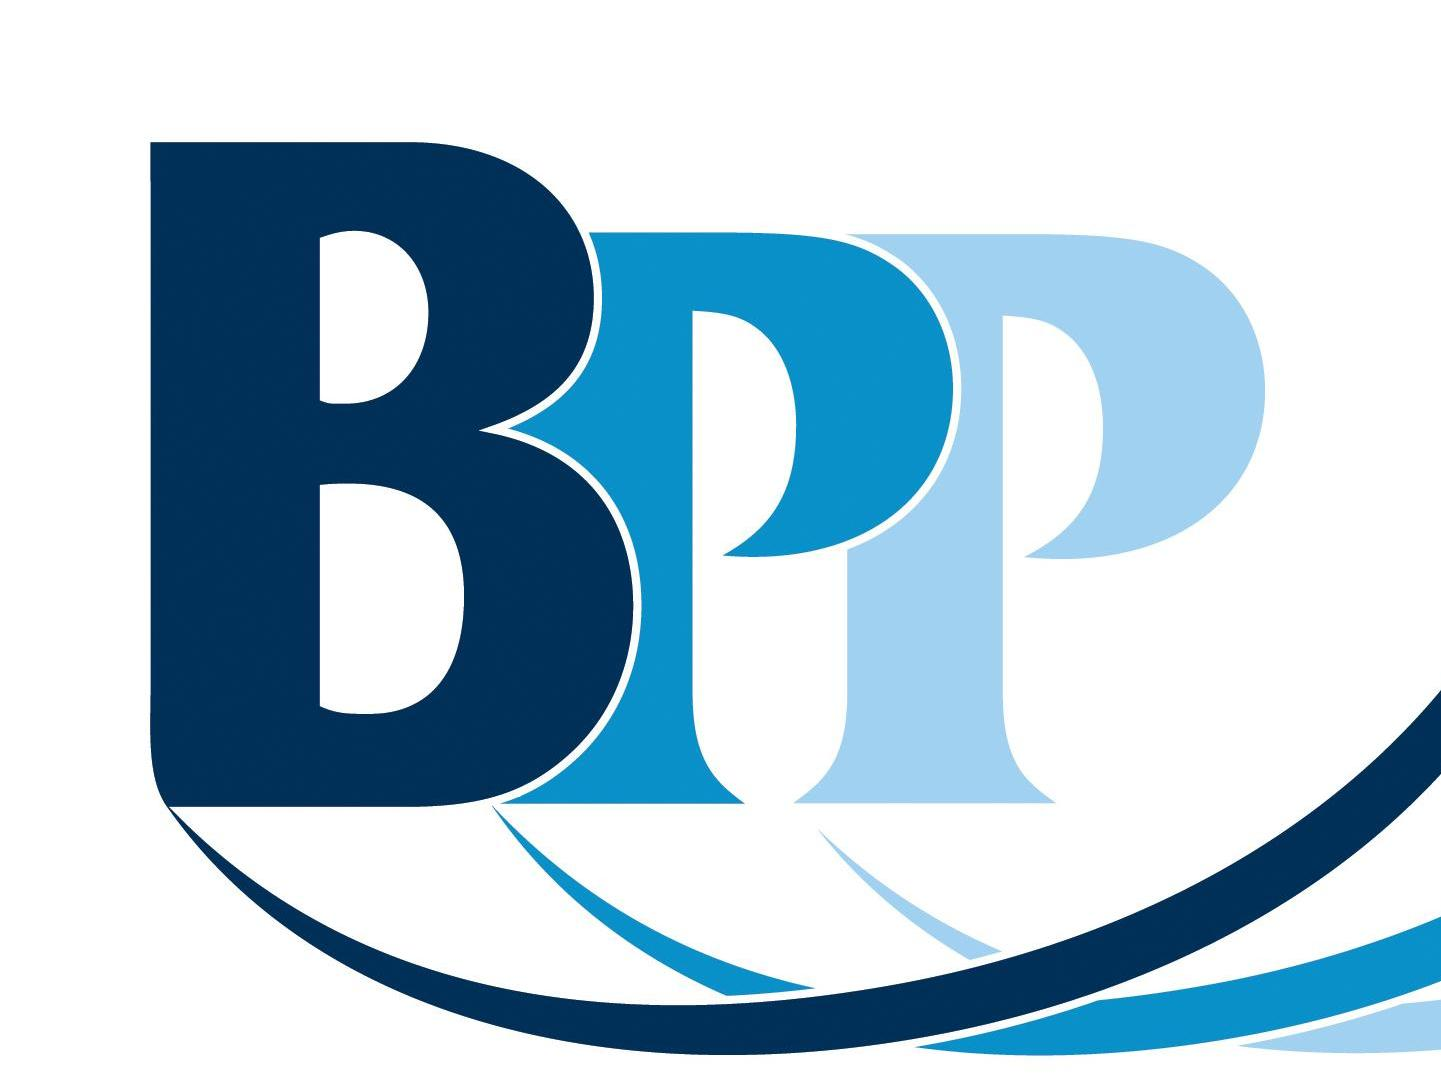 Acca bpp exam tips dec 2011